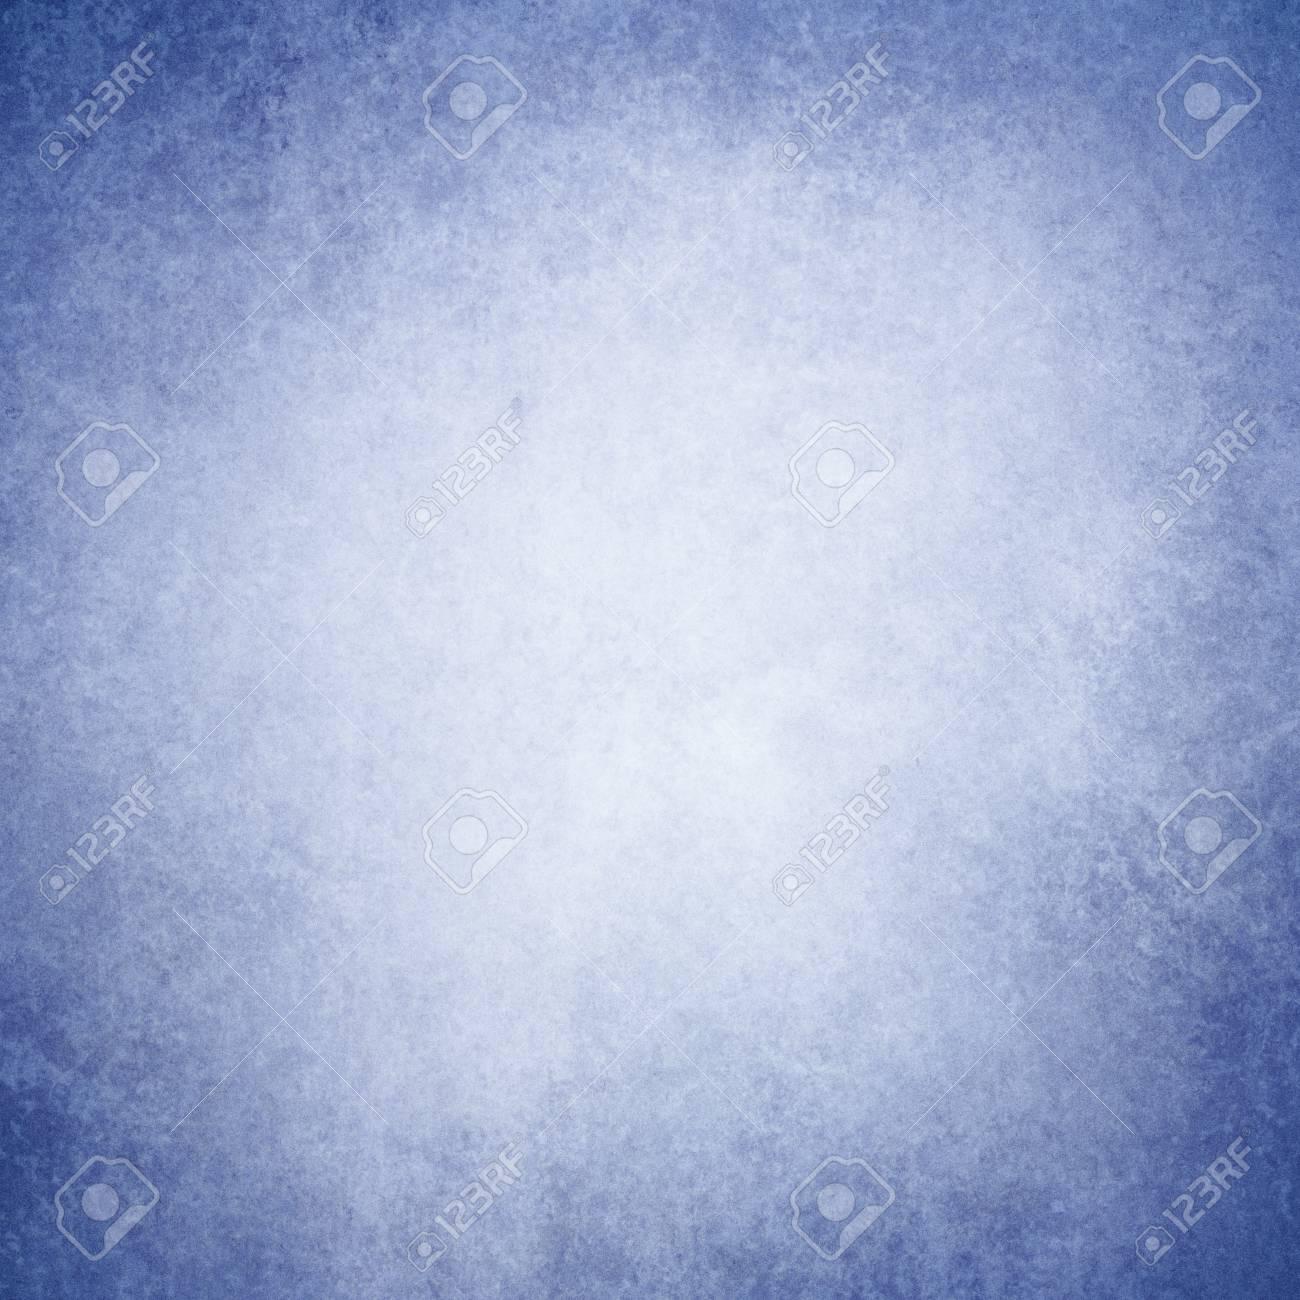 Blank Old White Background With Distressed Light Dark Navy Blue Border Design Textured Vintage Paper